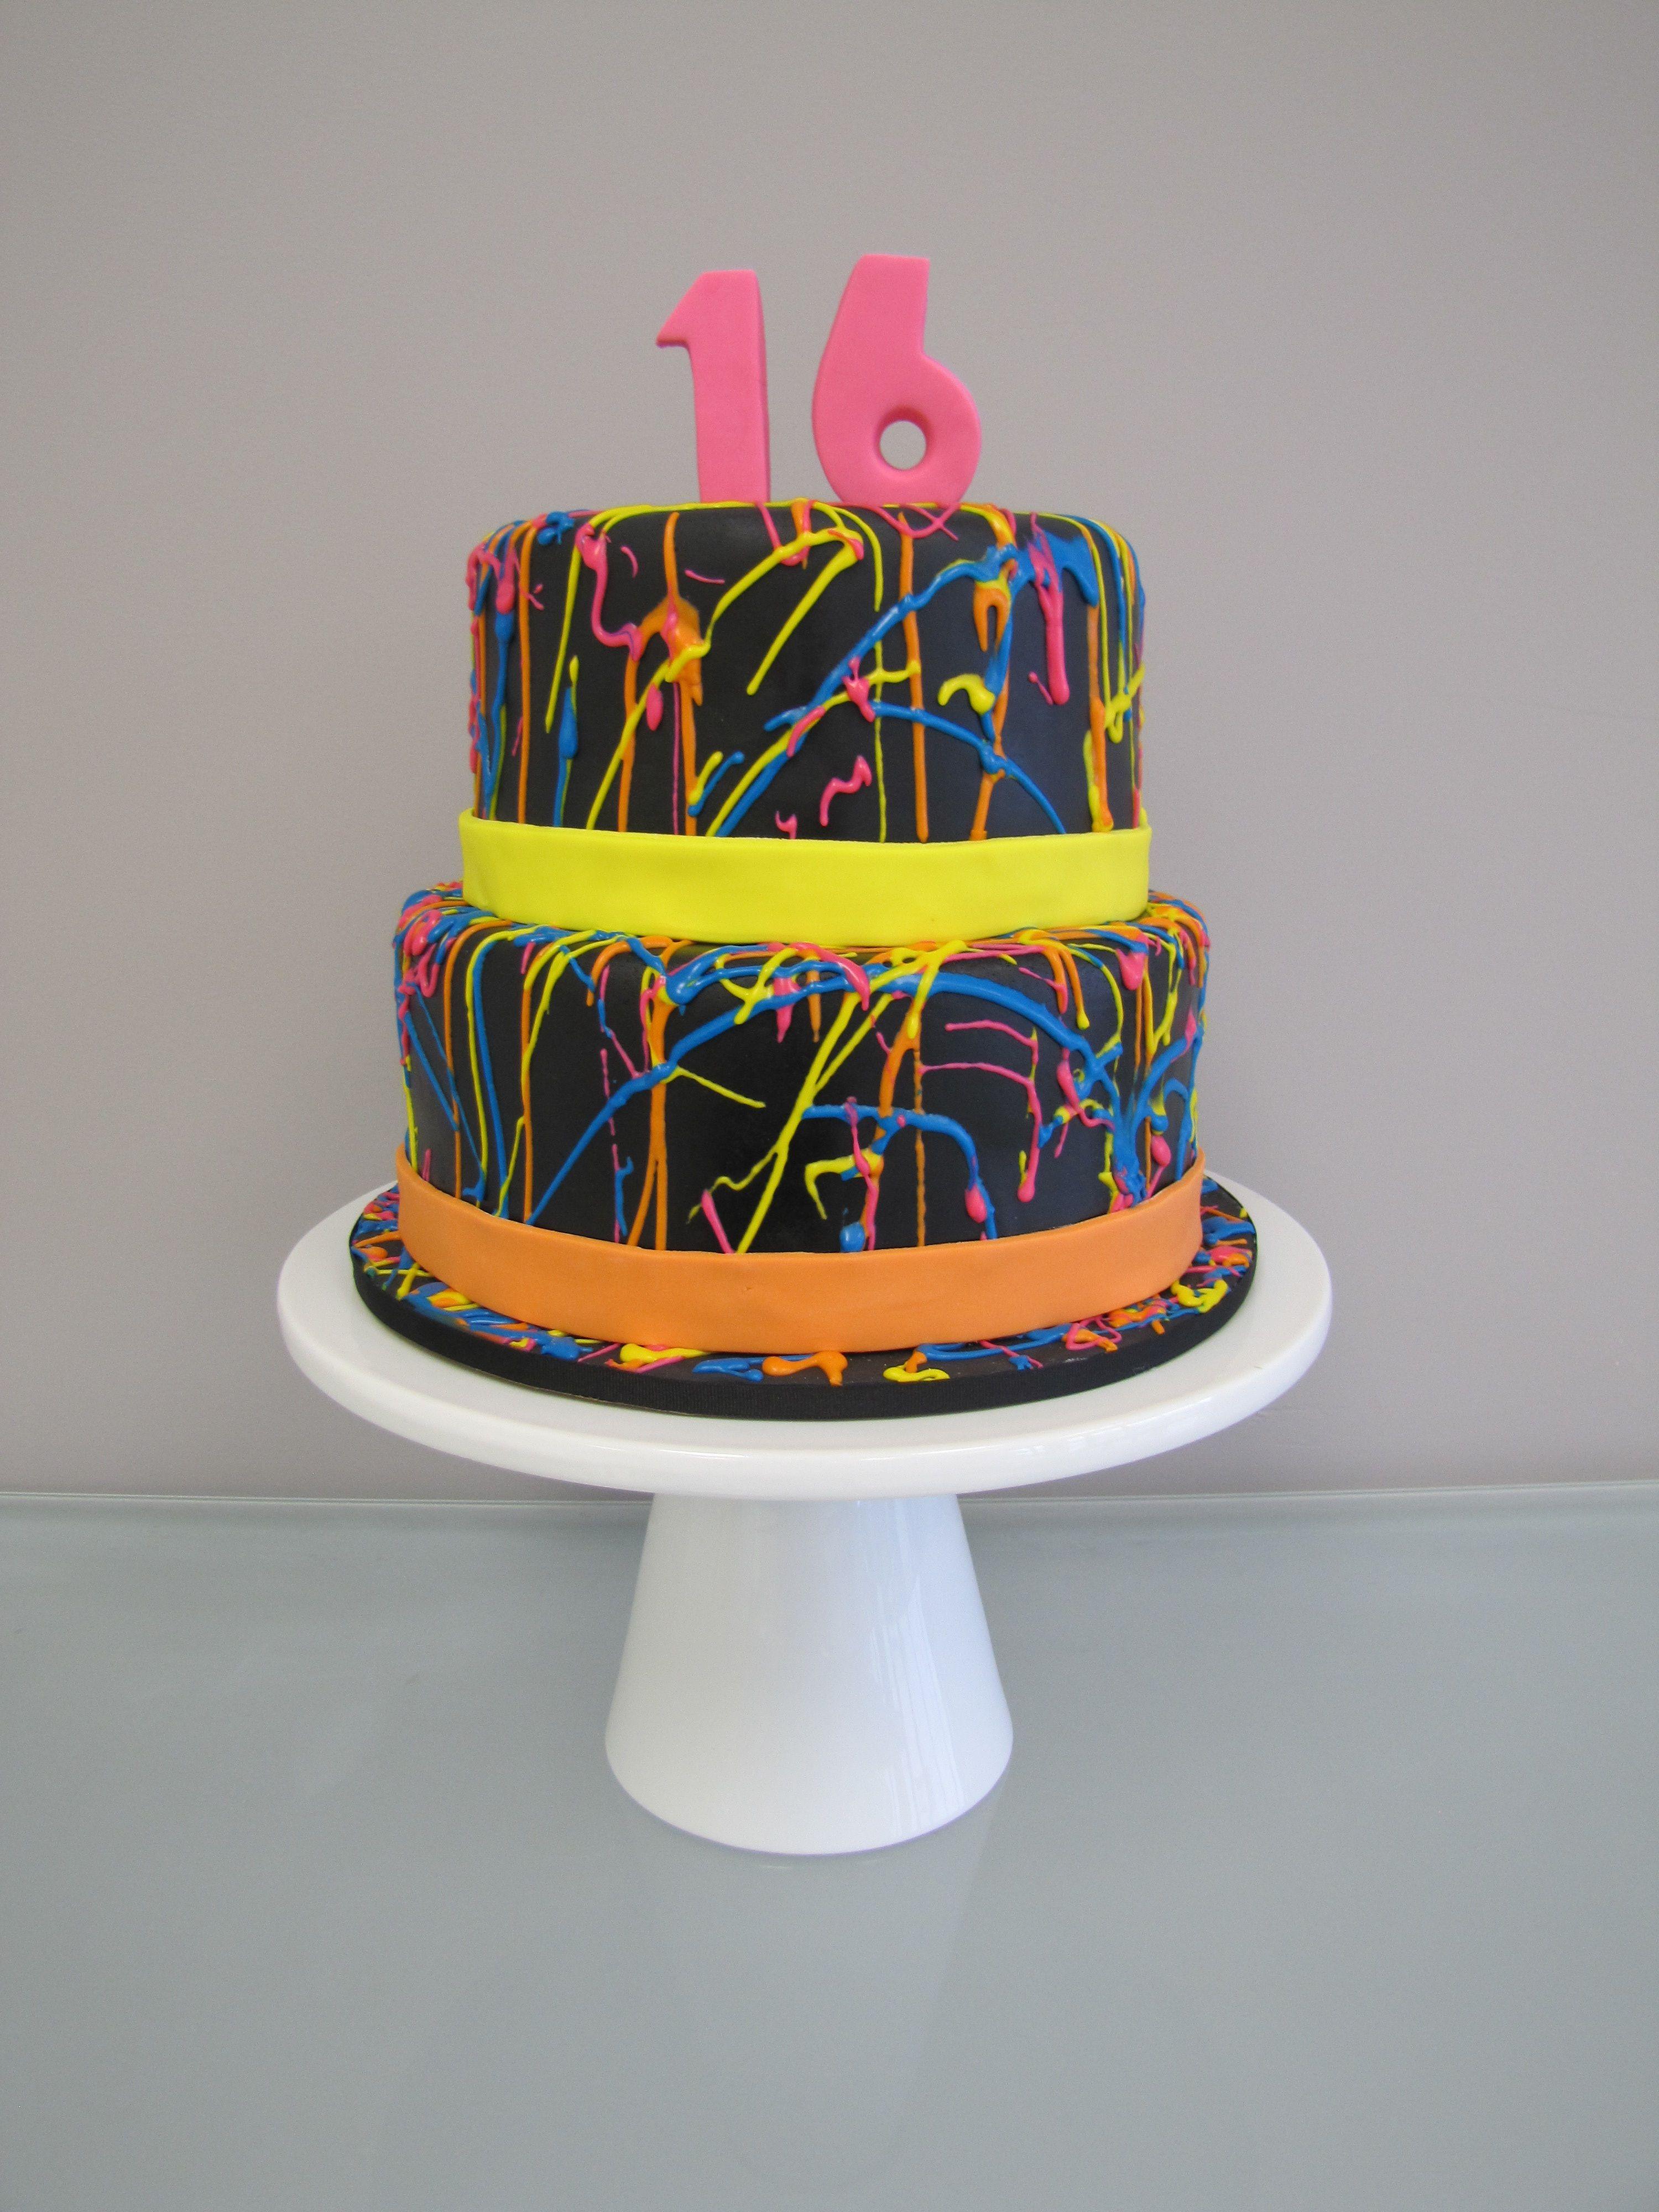 80s Neon Splatter Birthday Cake Birthday parties Pinterest